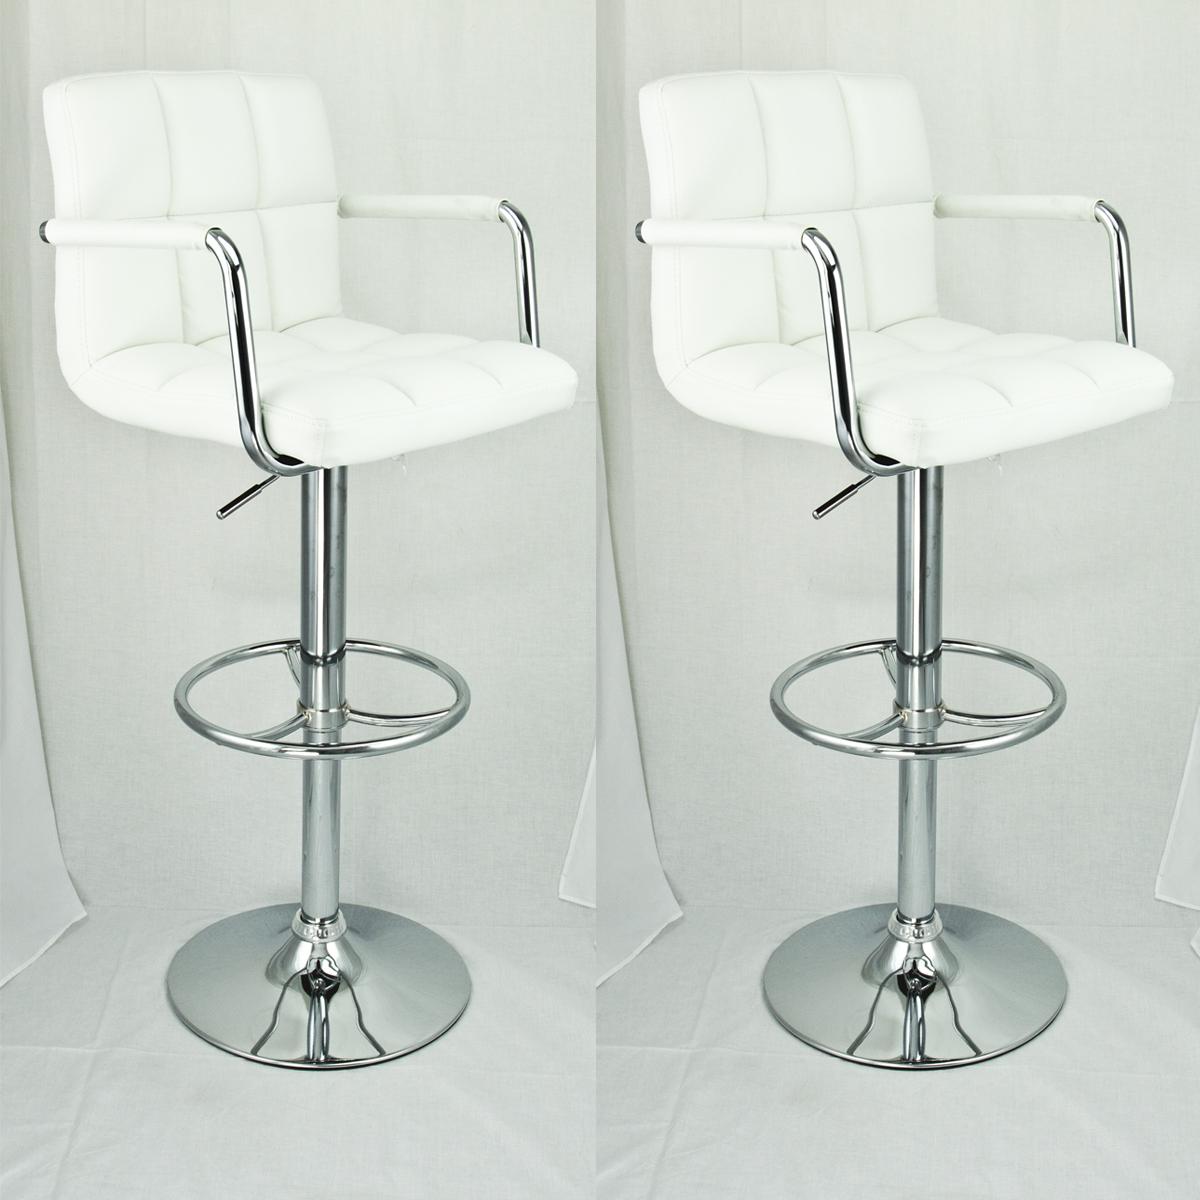 2 Set Swivel Barstools White Arm Leather Modern Adjustable